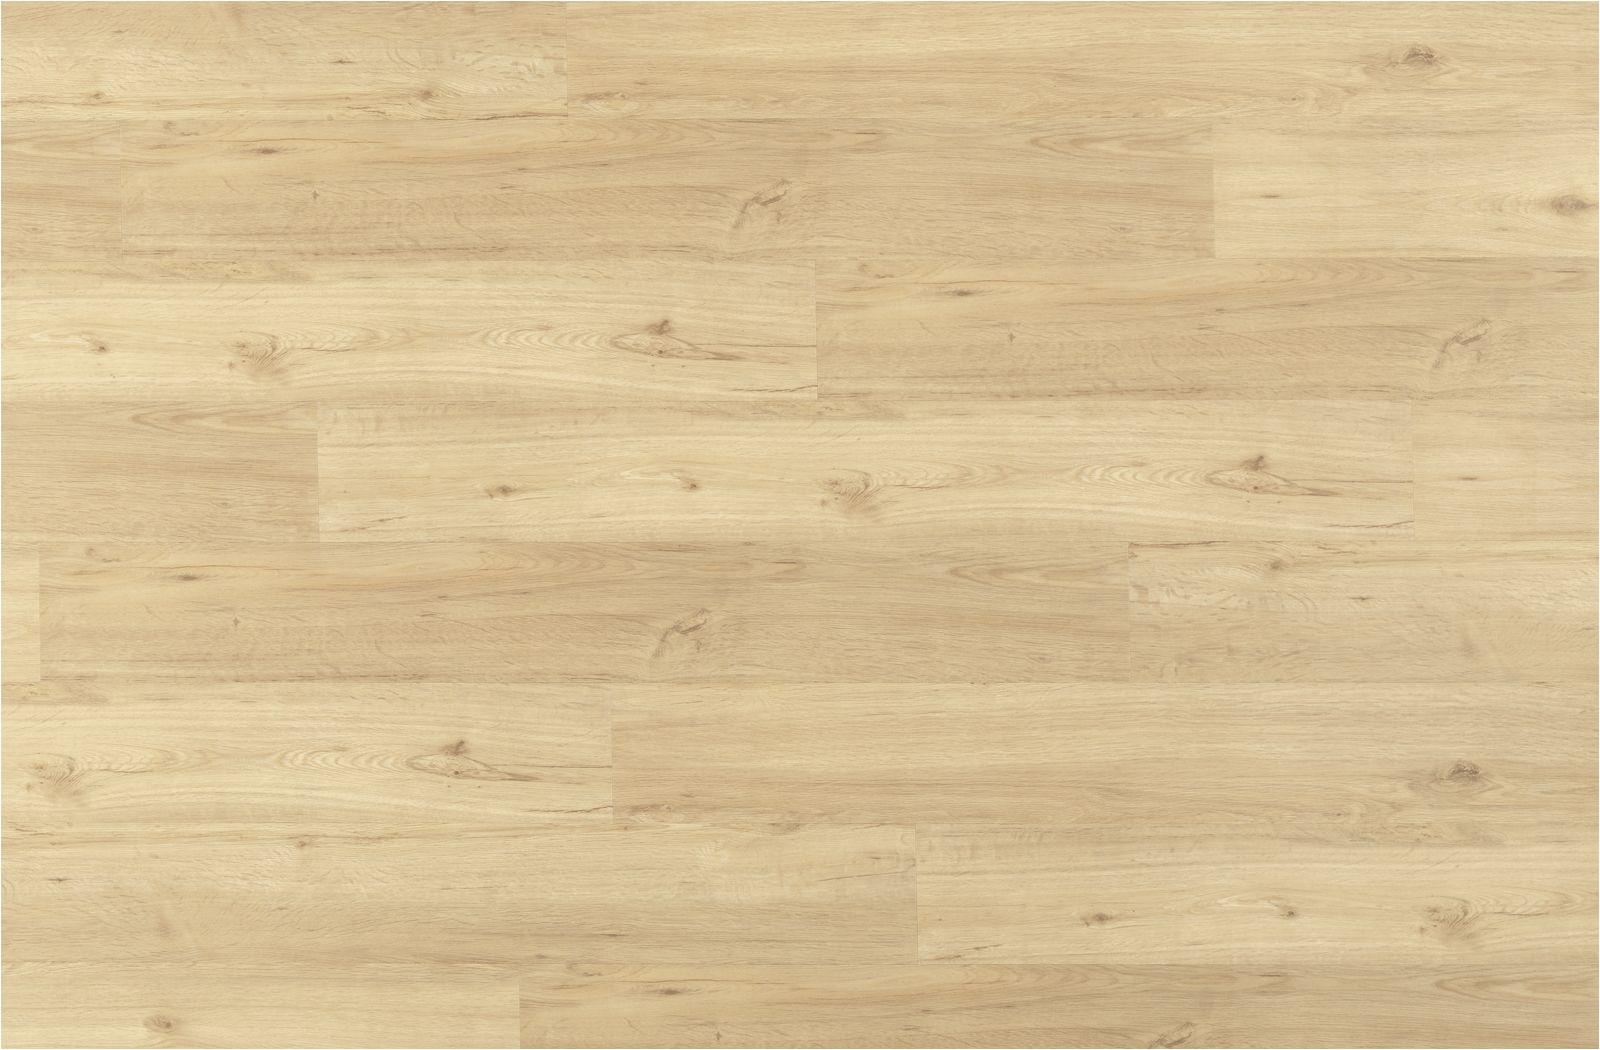 Wooden Flooring Texture Www Hafary Com Sg Collection Wood Berryalloc Bav2977 Summer Pine 464